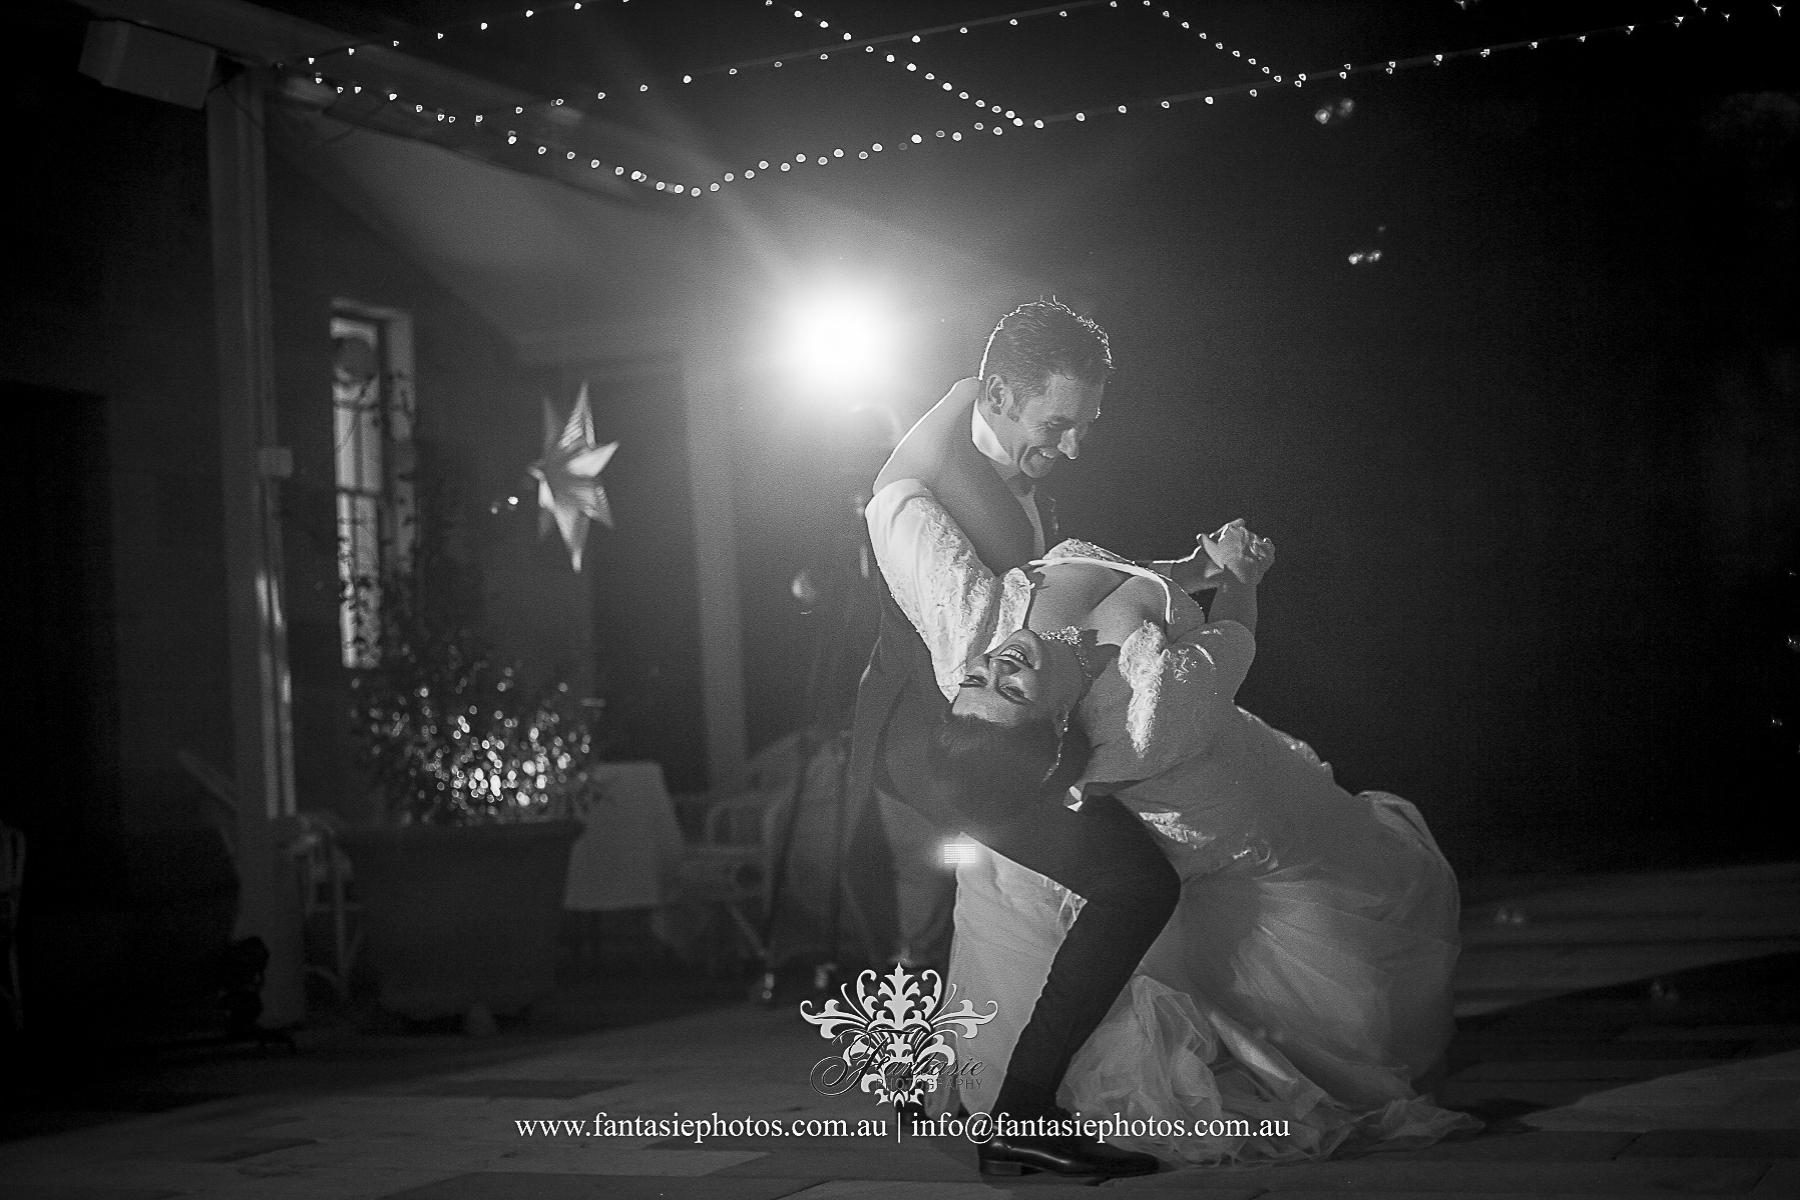 Stunning Capture First dance Bride and Groom at Gunner Barracks Mosman | Fantasie Photography